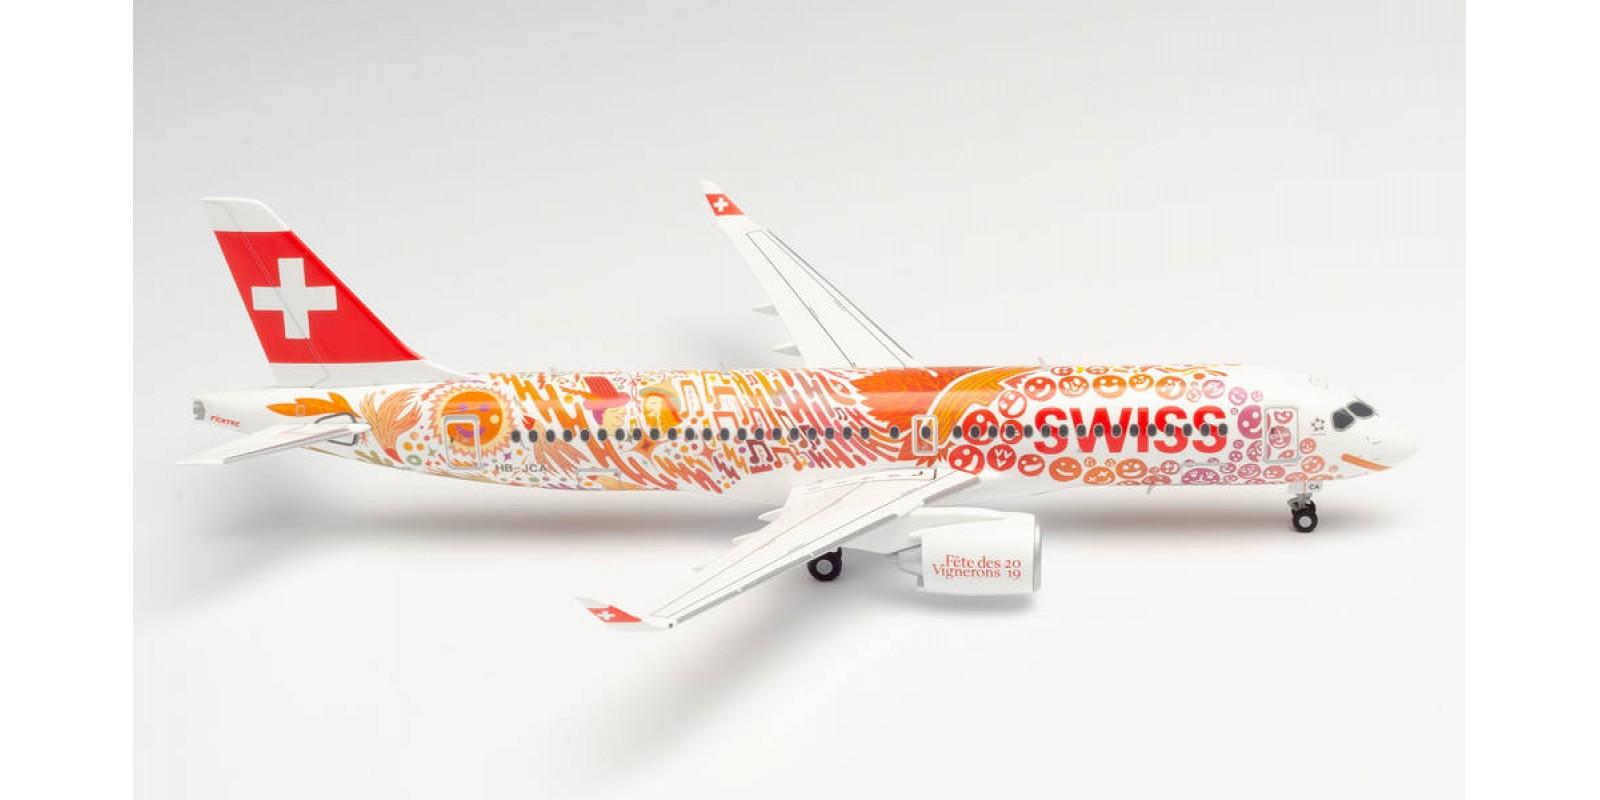 "HR559935 SWISS INTERNATIONAL AIR LINES AIRBUS A220-300 ""FÊTE DES VIGNERONS"""